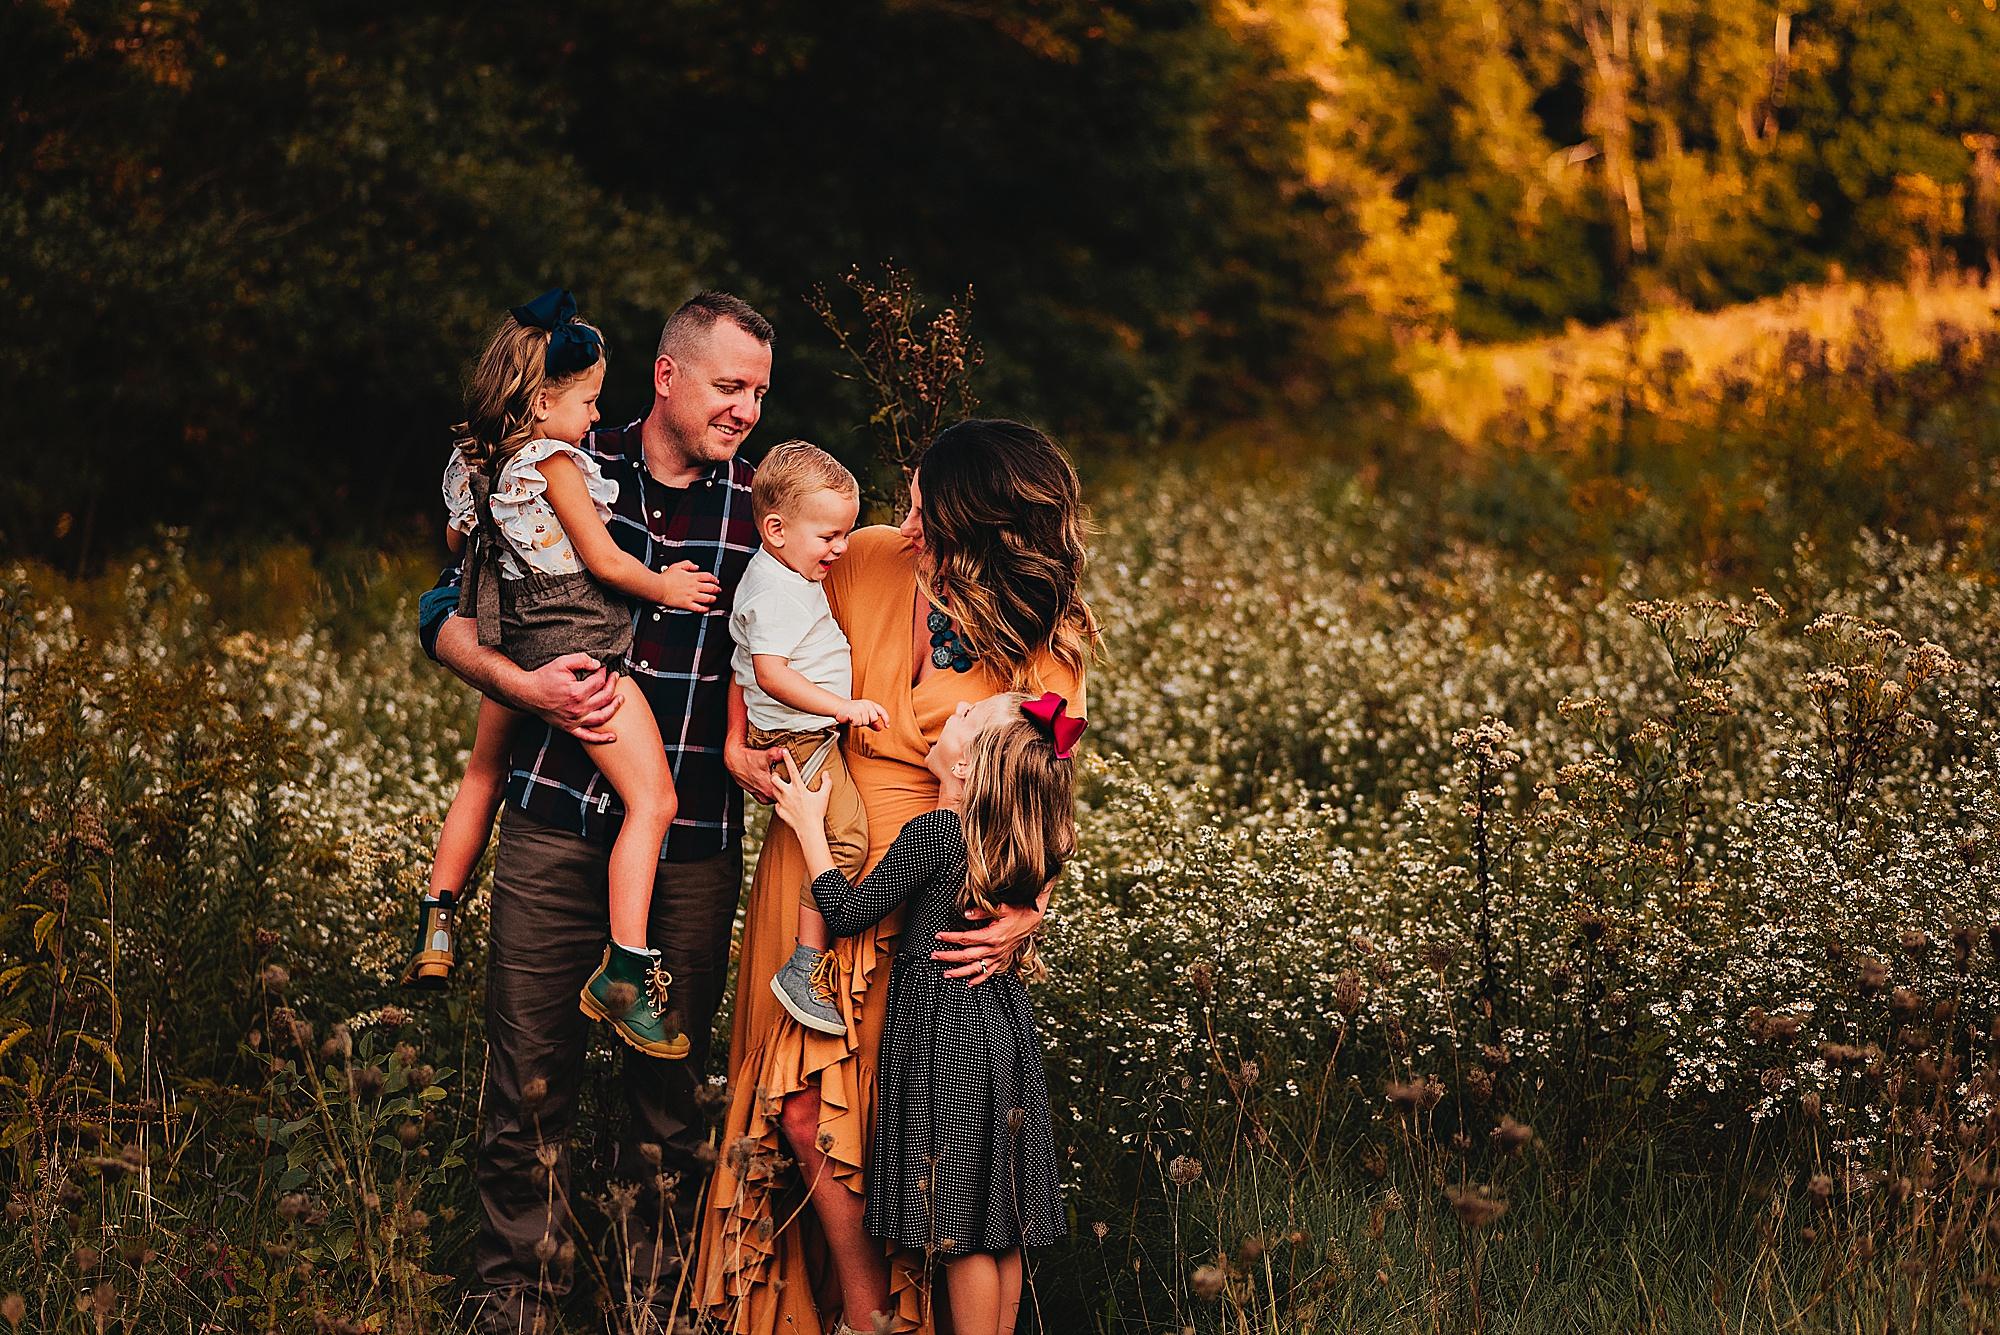 lauren-grayson-photography-akron-ohio-best-family-photos-2018-cleveland_0020.jpg